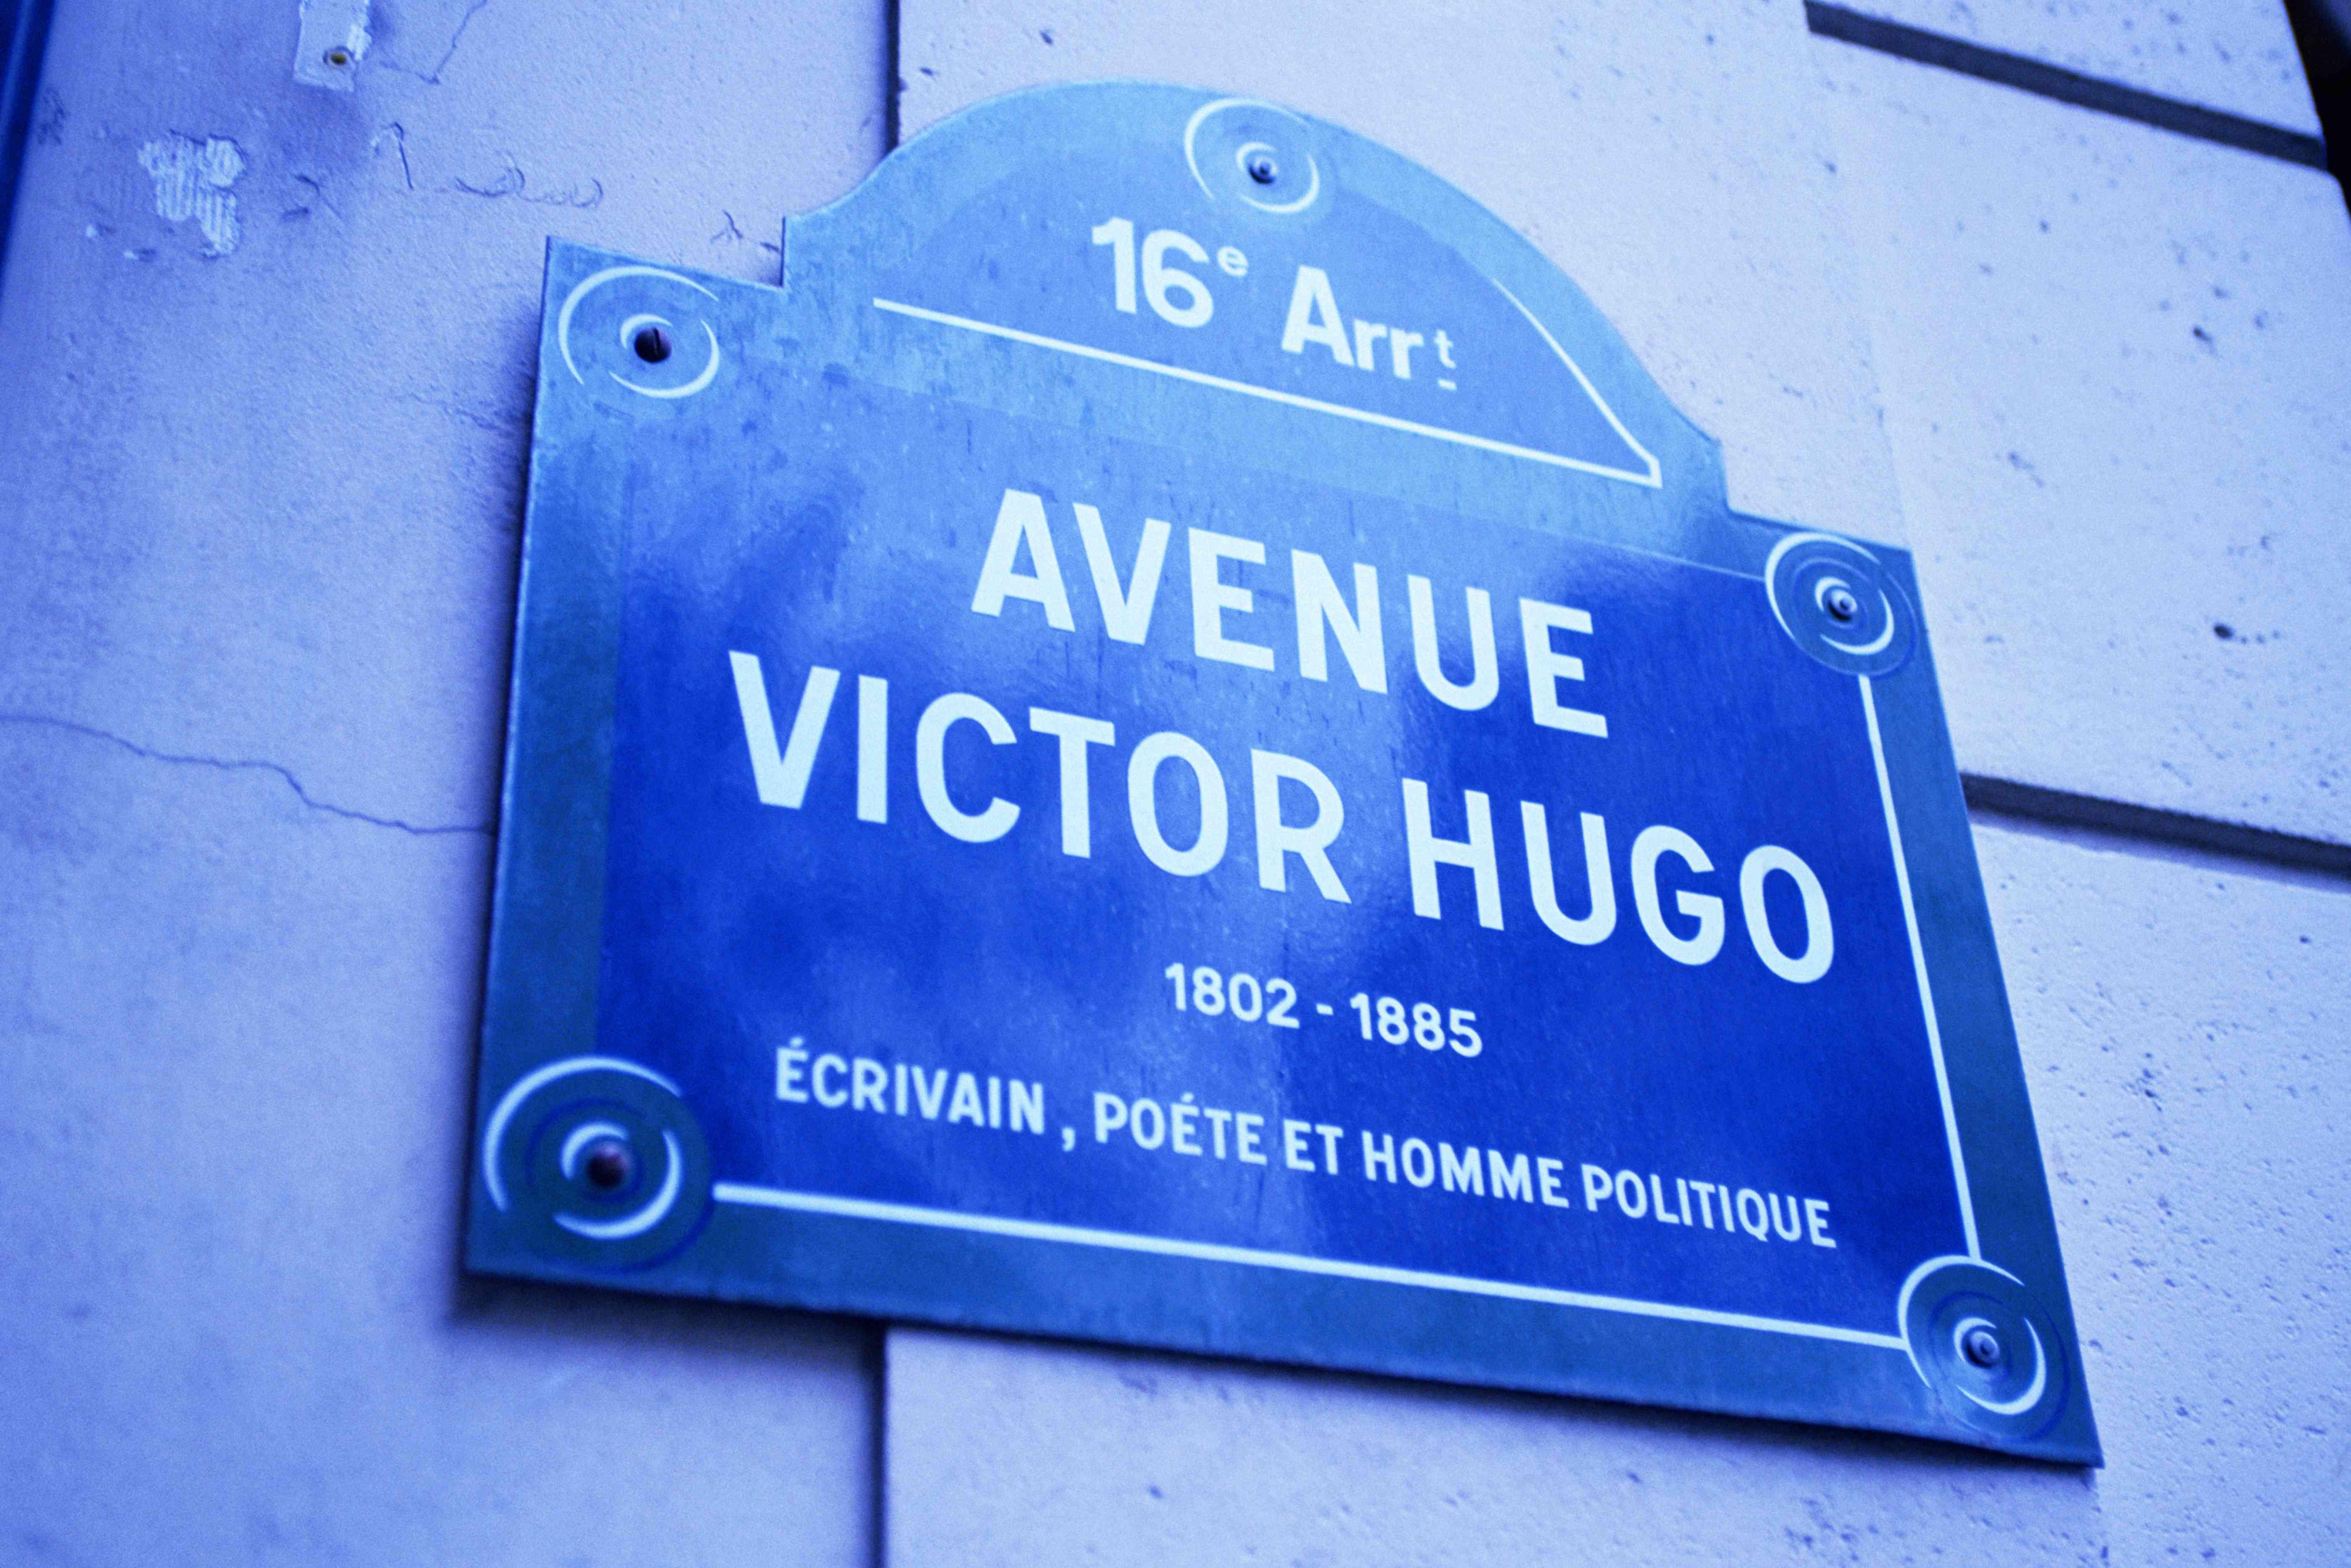 Street sign for Avenue Victor Hugo in Paris